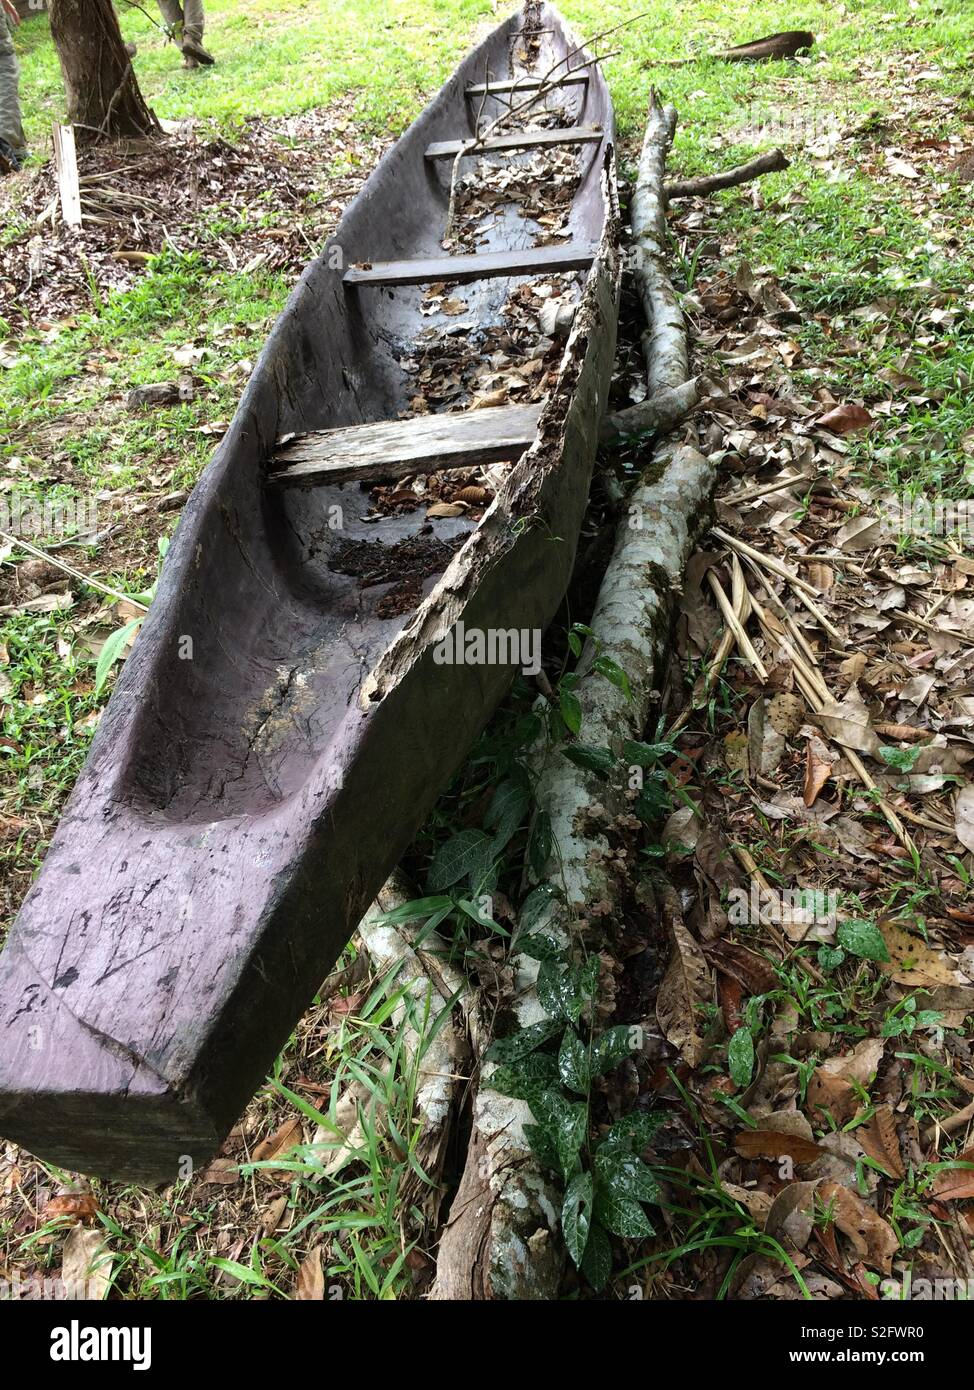 Dugout canoe - Stock Image